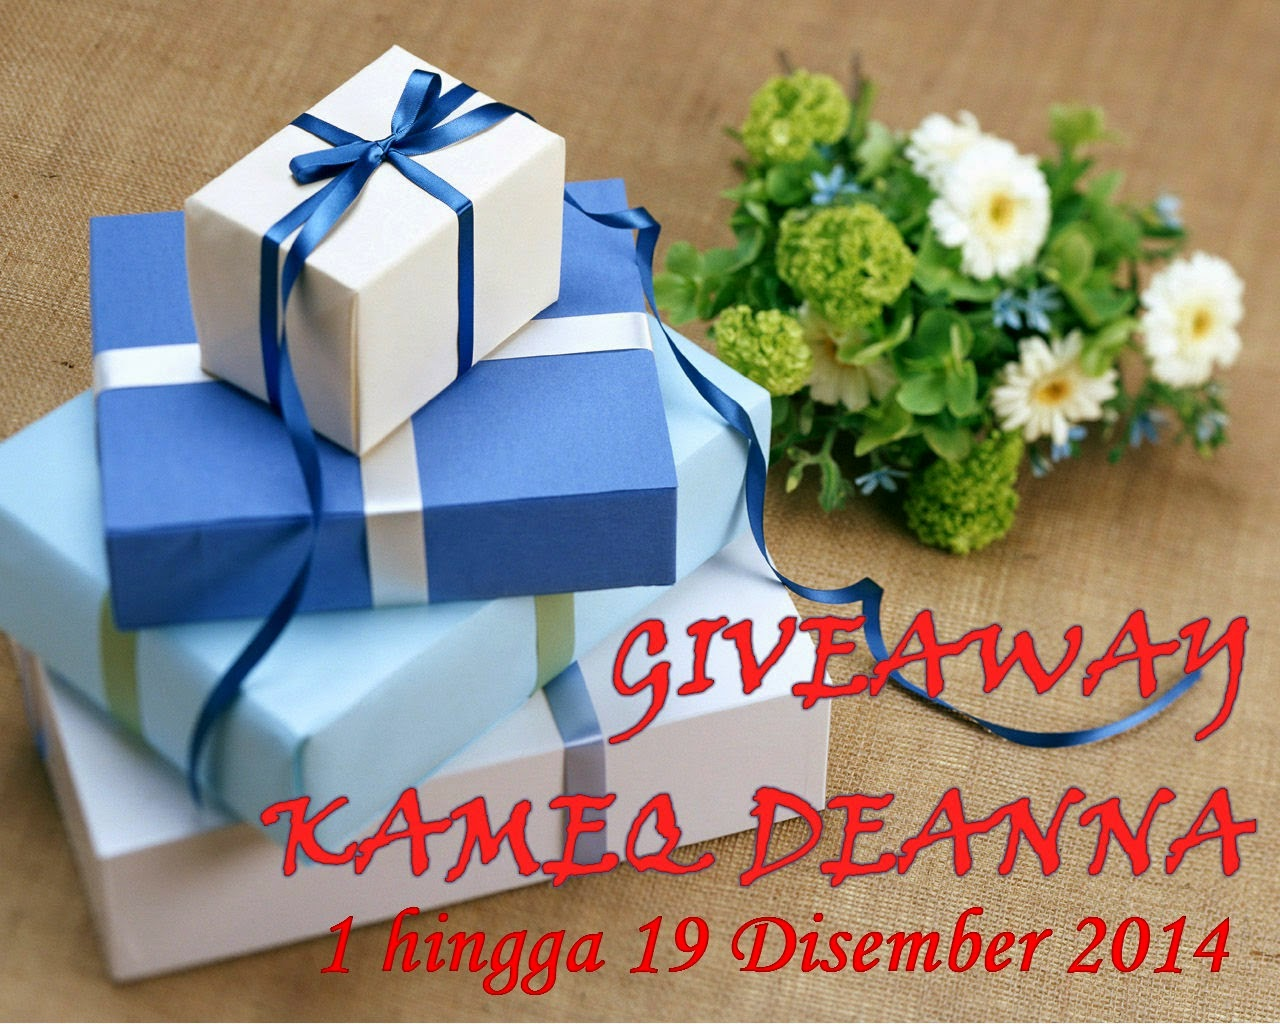 giveaway kameq deanna